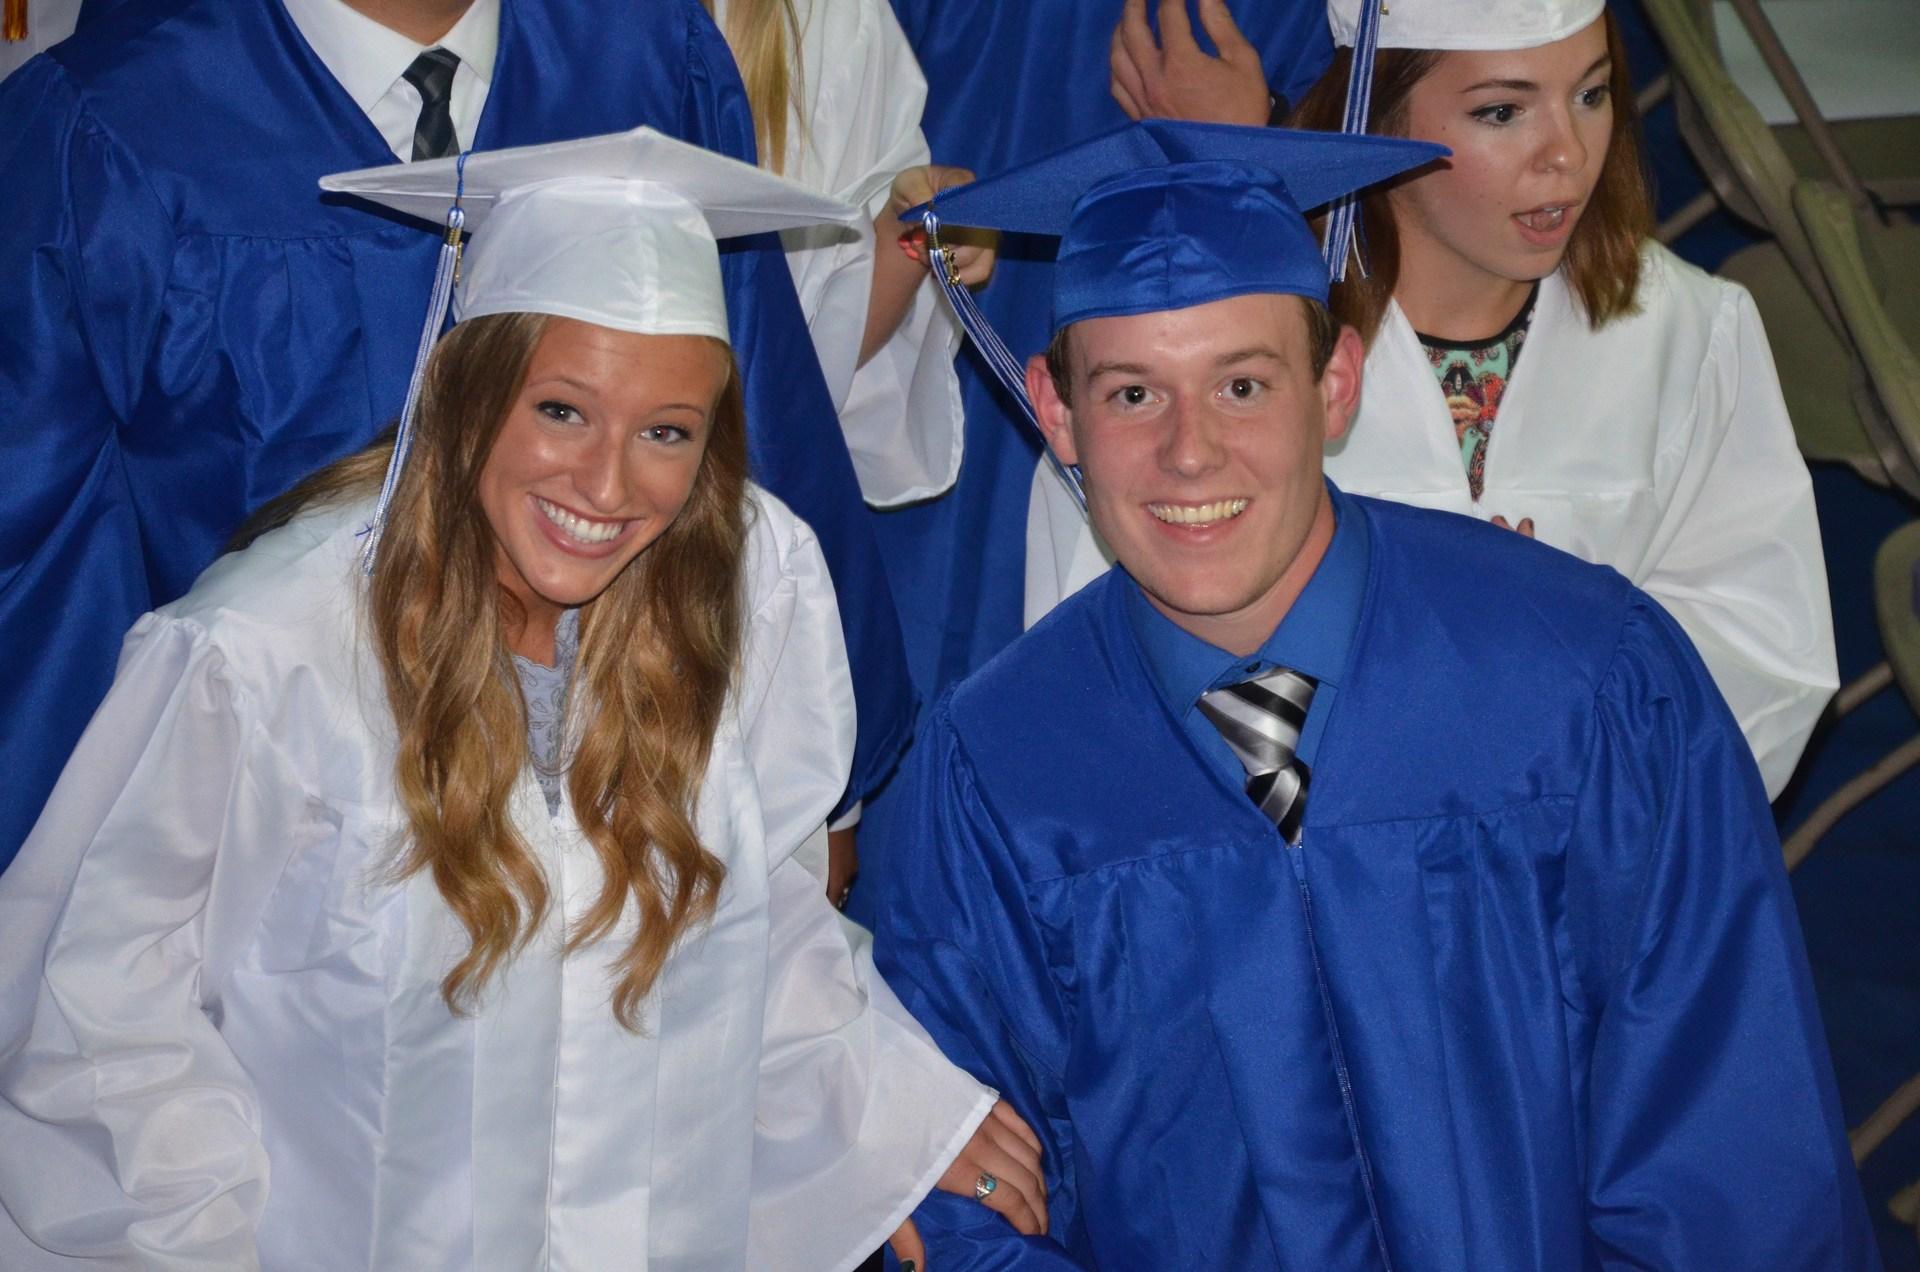 Two graduates smiling